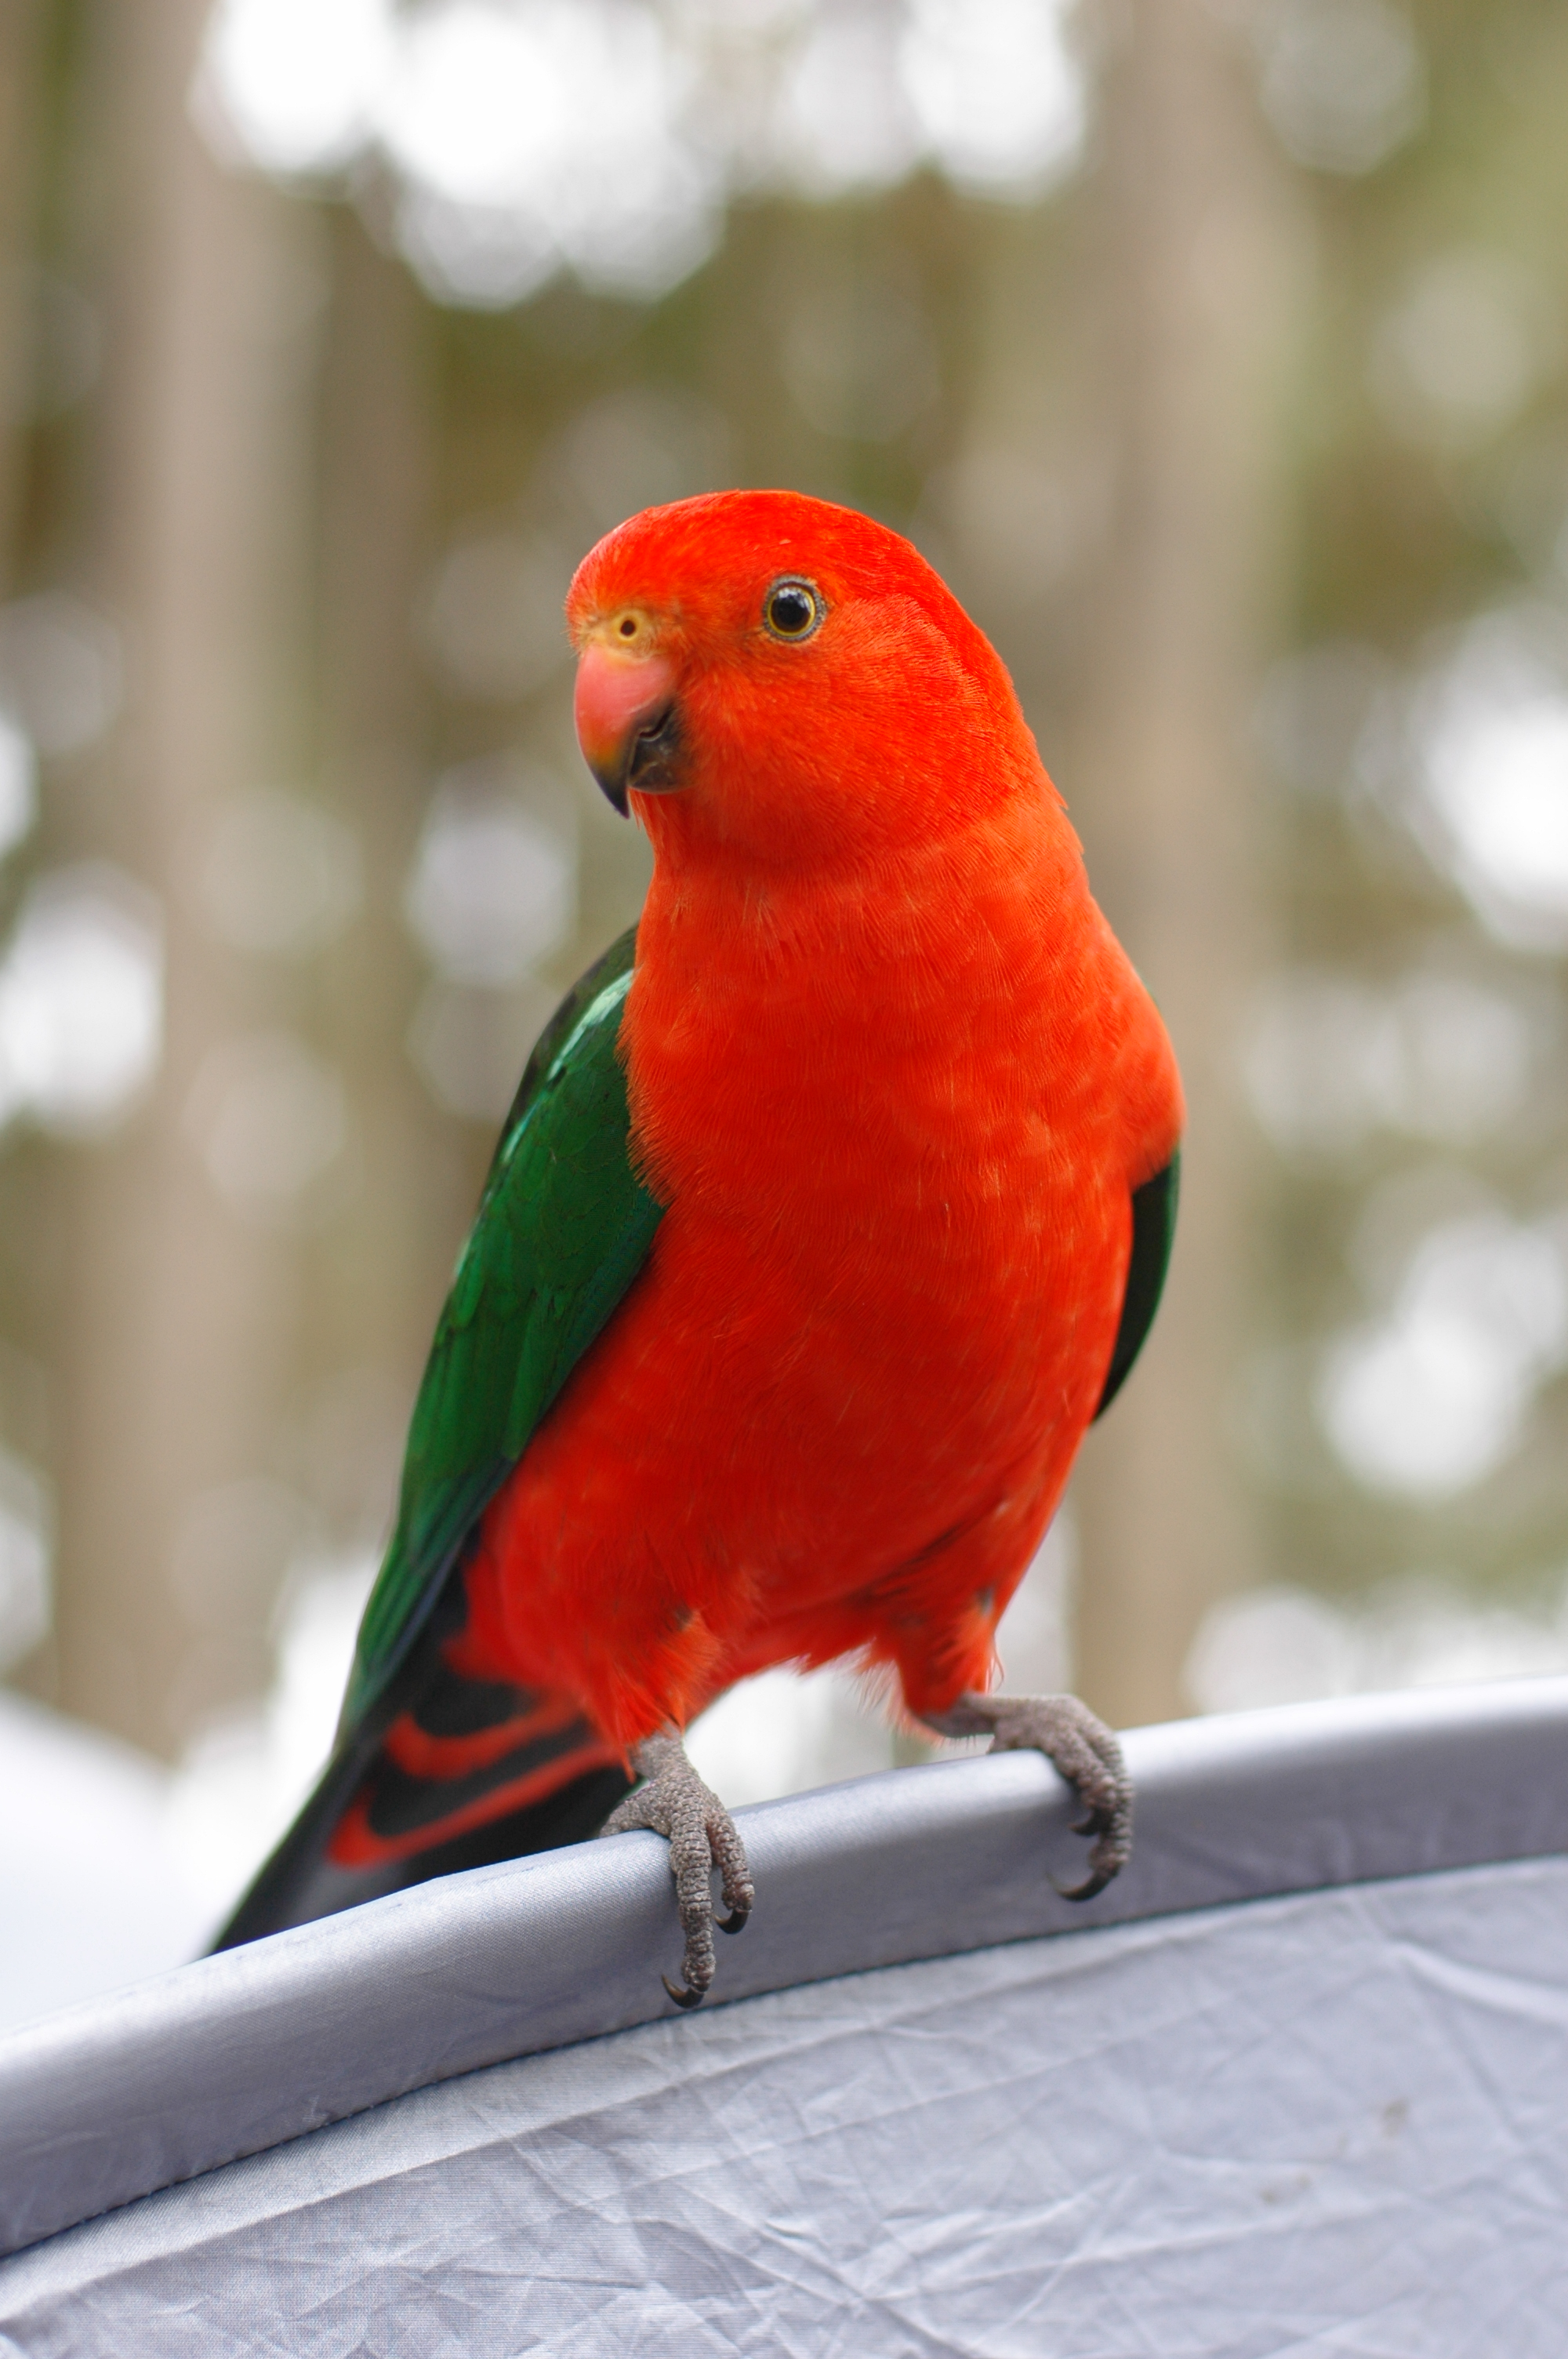 http://upload.wikimedia.org/wikipedia/commons/b/bd/Alisterus_scapularis_-NSW_-Australia-6.jpg